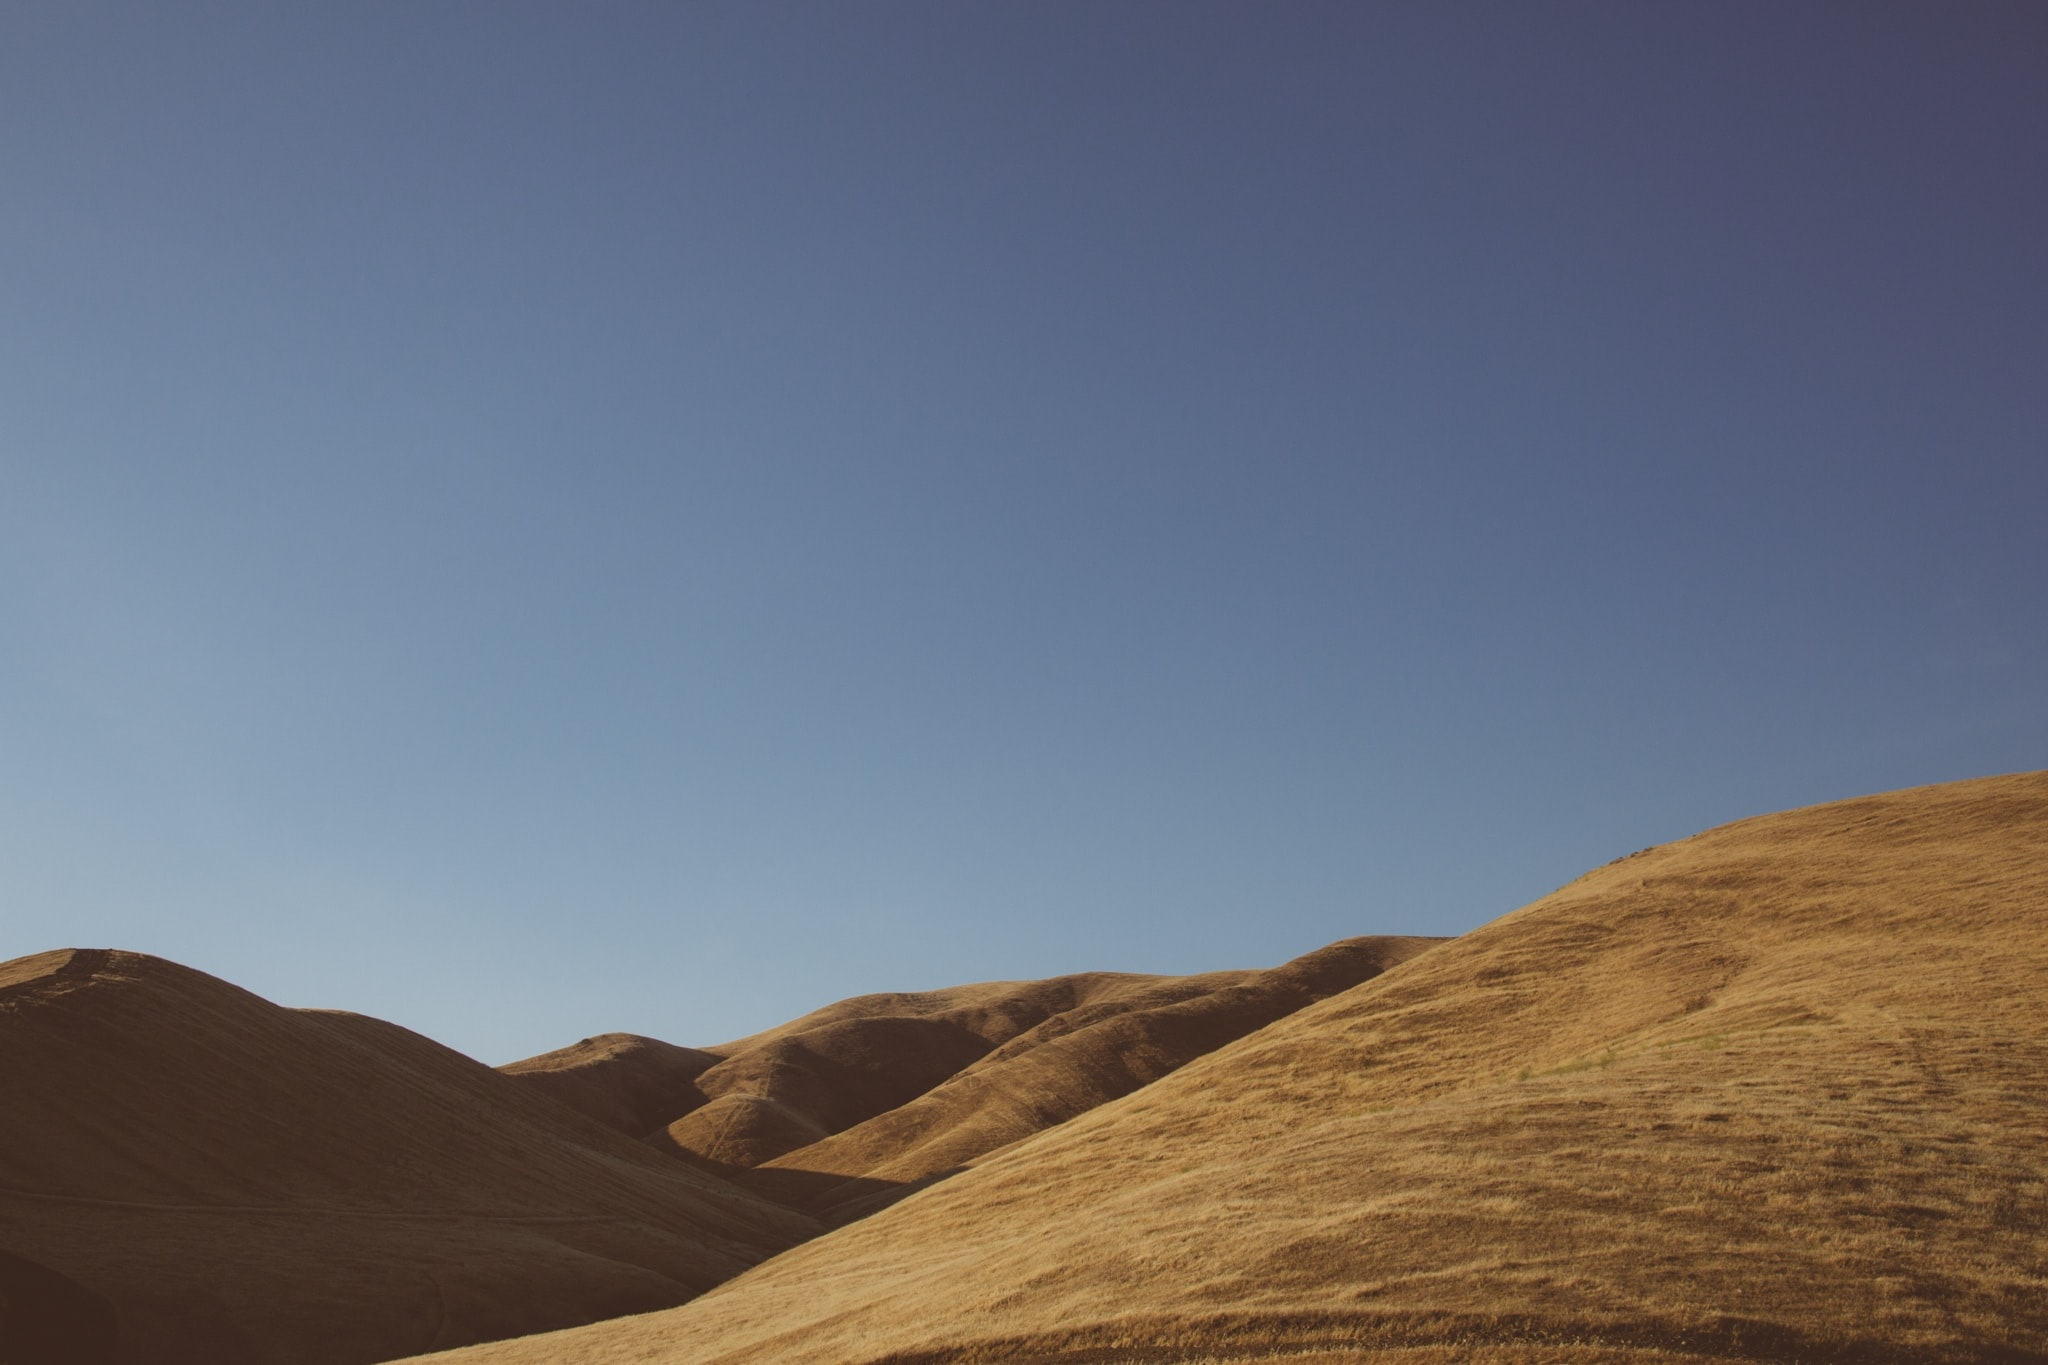 A wide angle shot of arid hills.